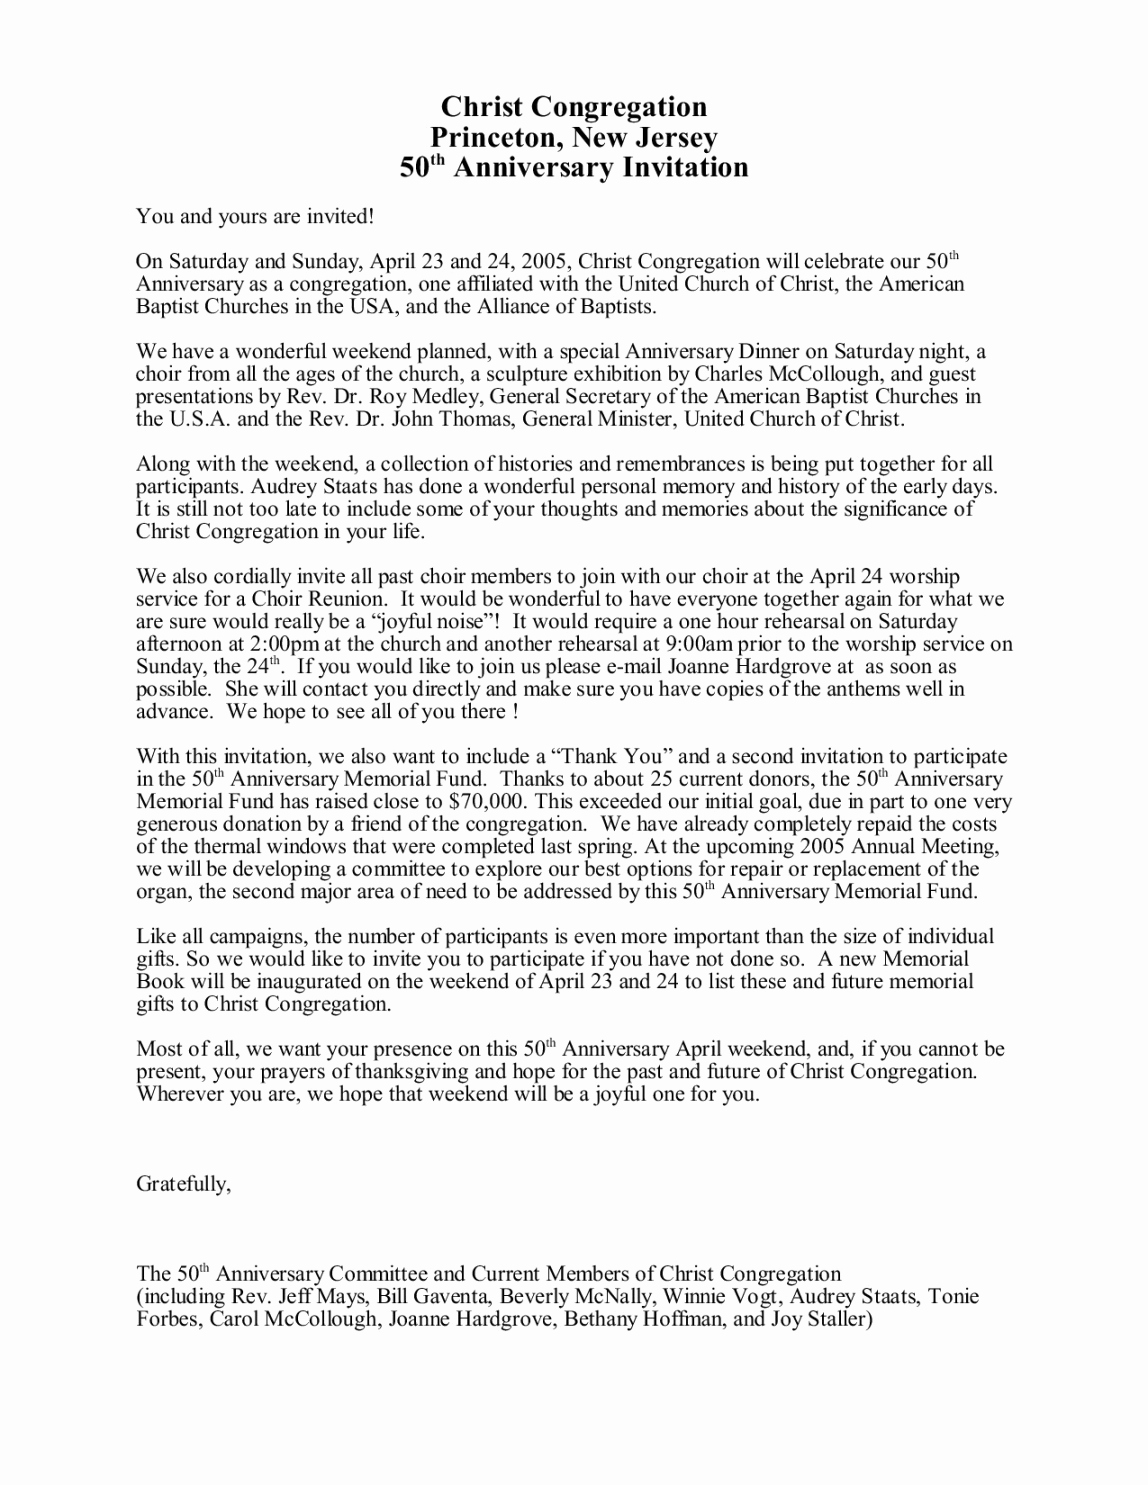 Pastor Anniversary Invitation Letter Inspirational Free Sample Invitation Letter for Pastor Anniversary